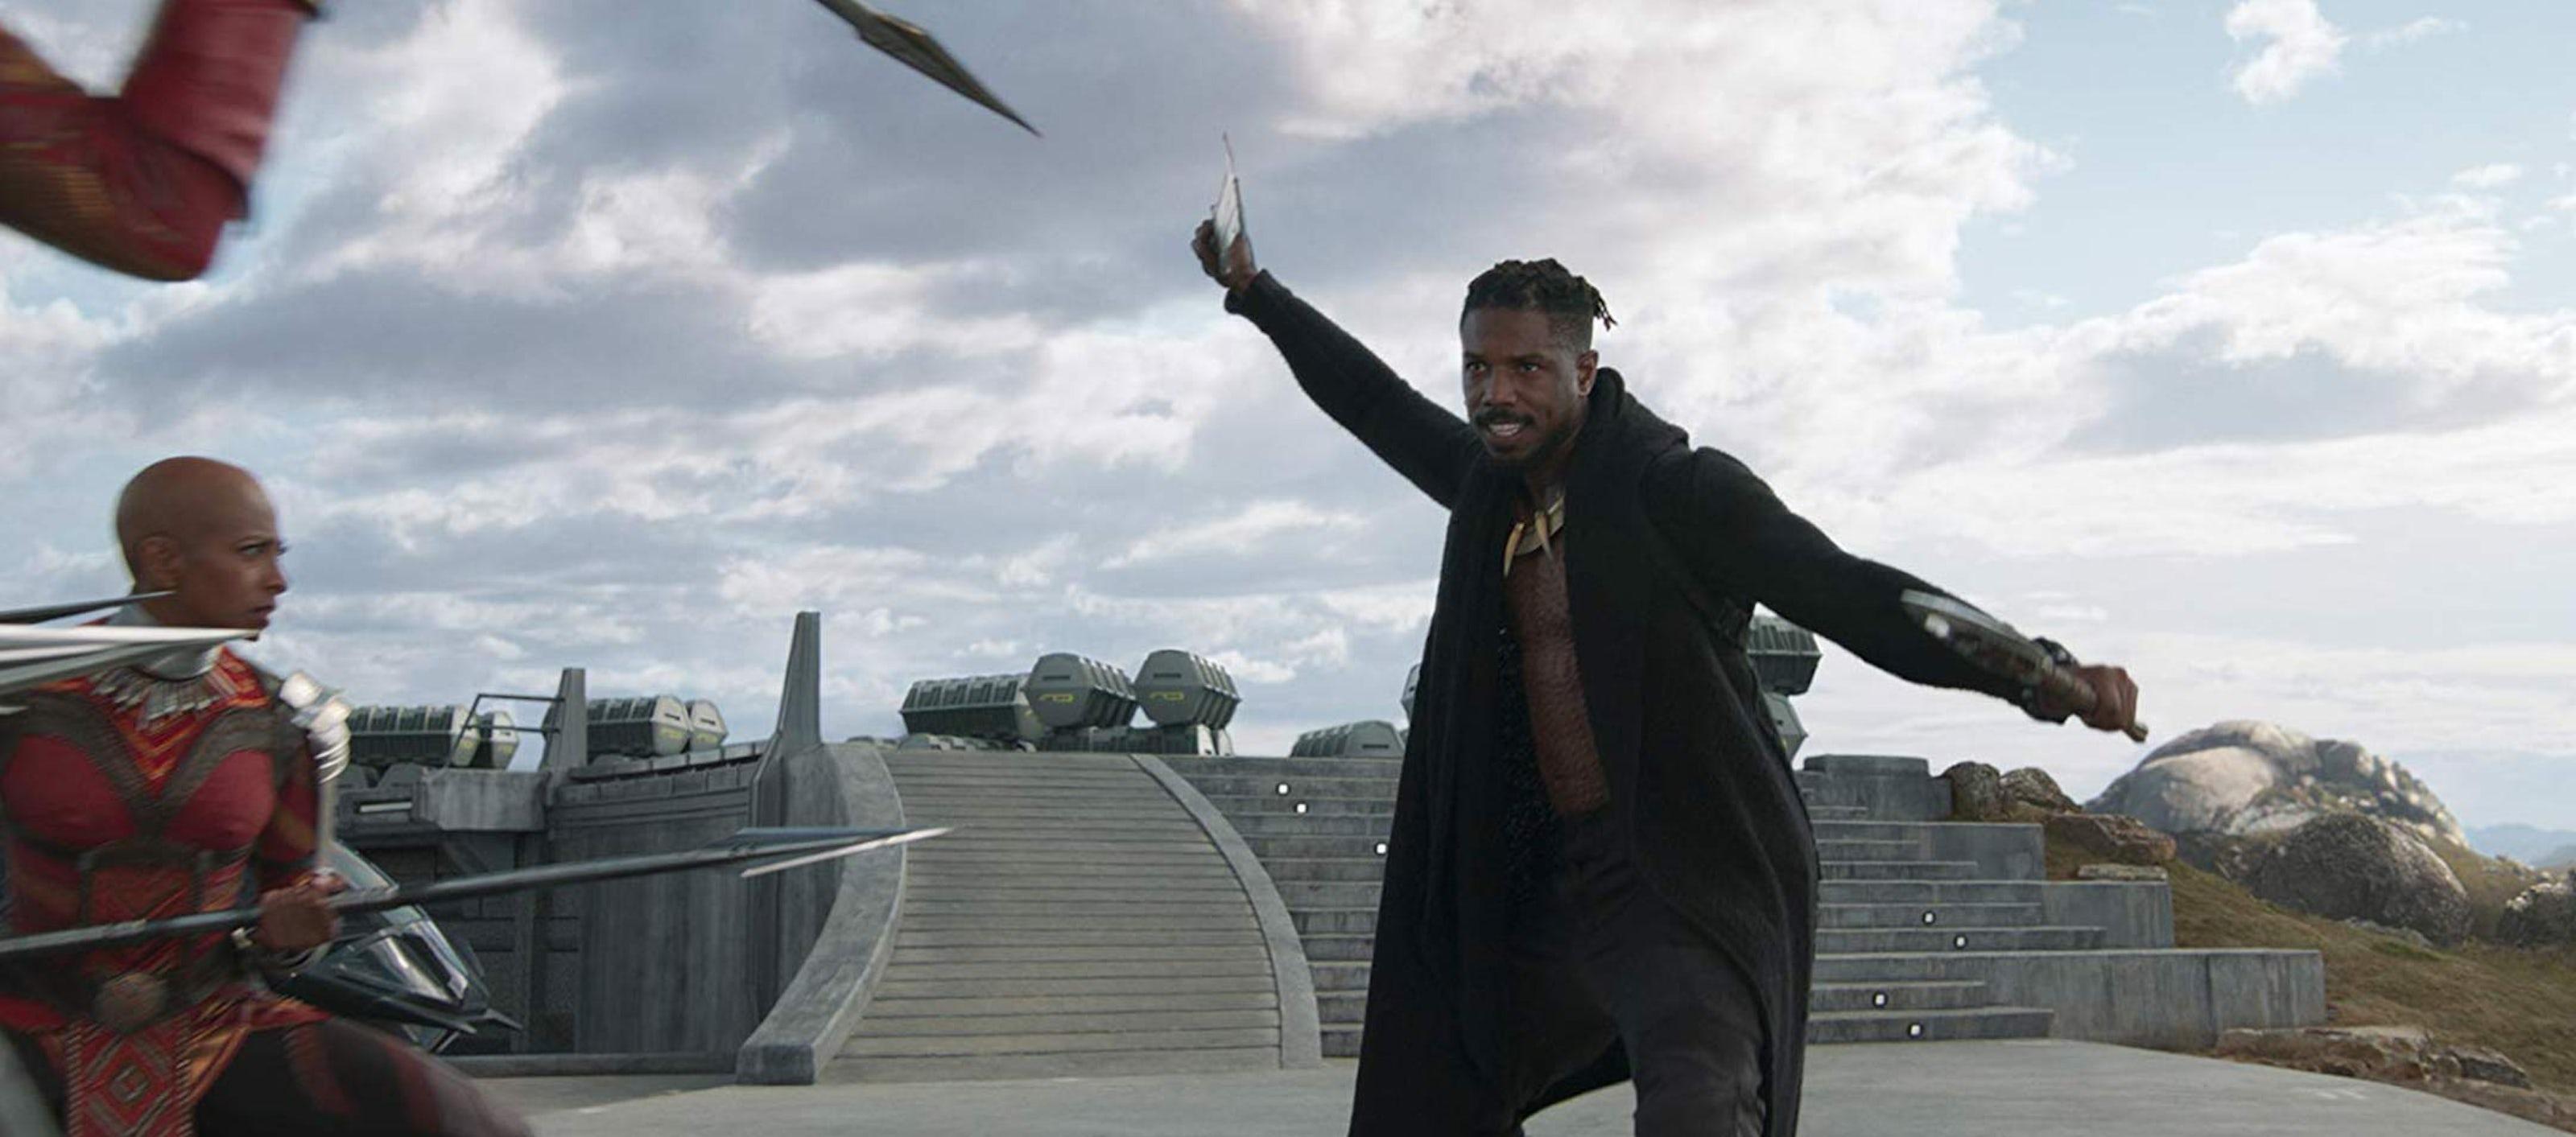 The Best Movie Villains with Badass Leadership Skills - ONE37pm